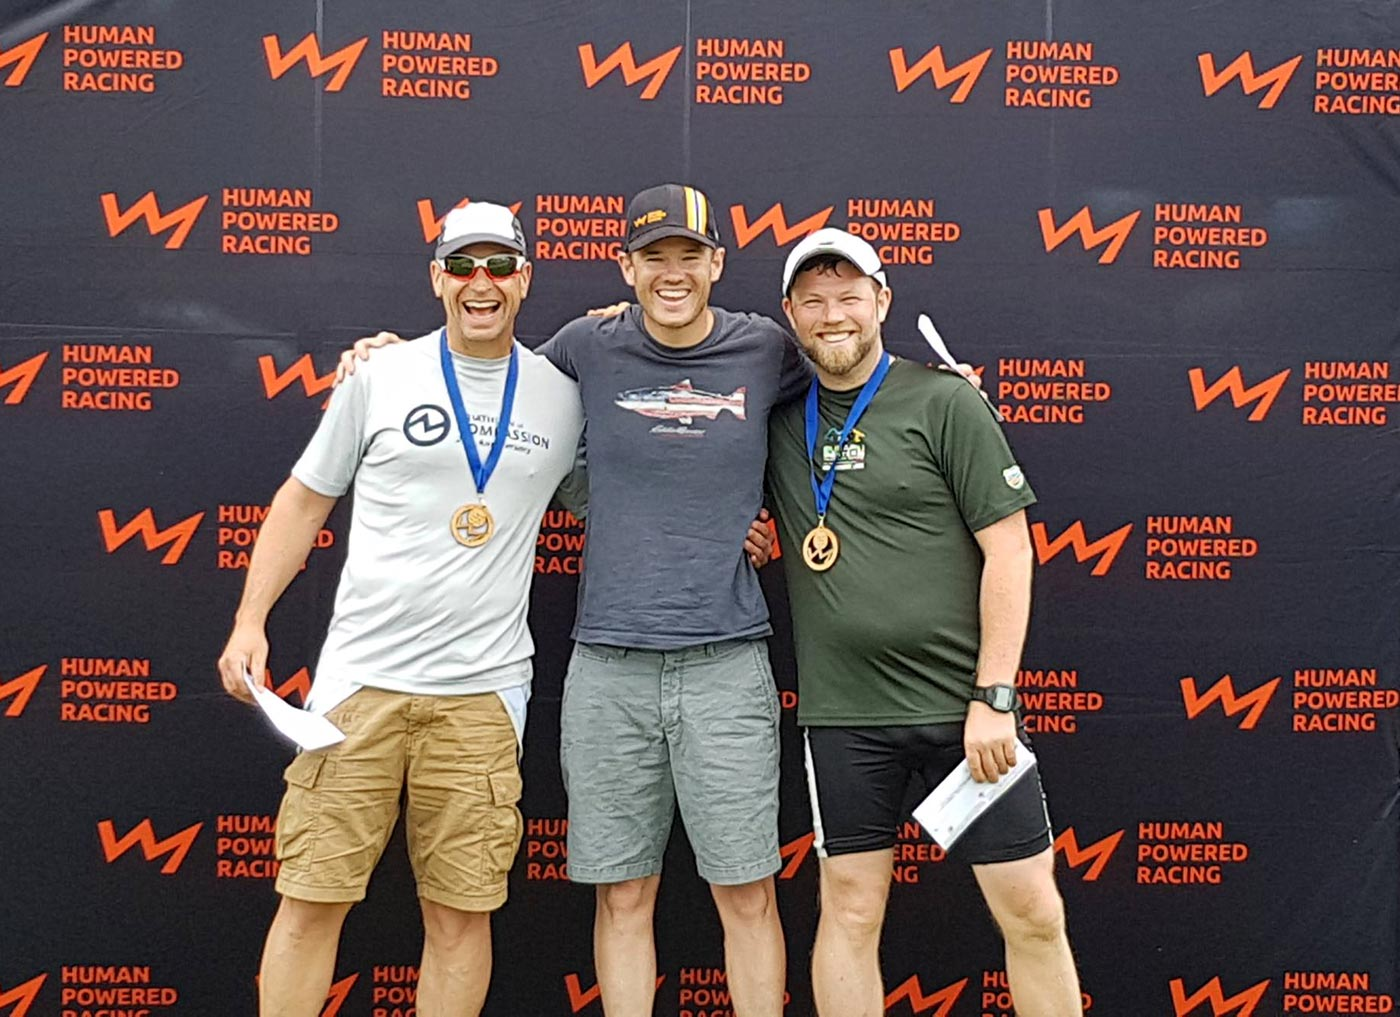 Three winners at the Triathlon of Compassion